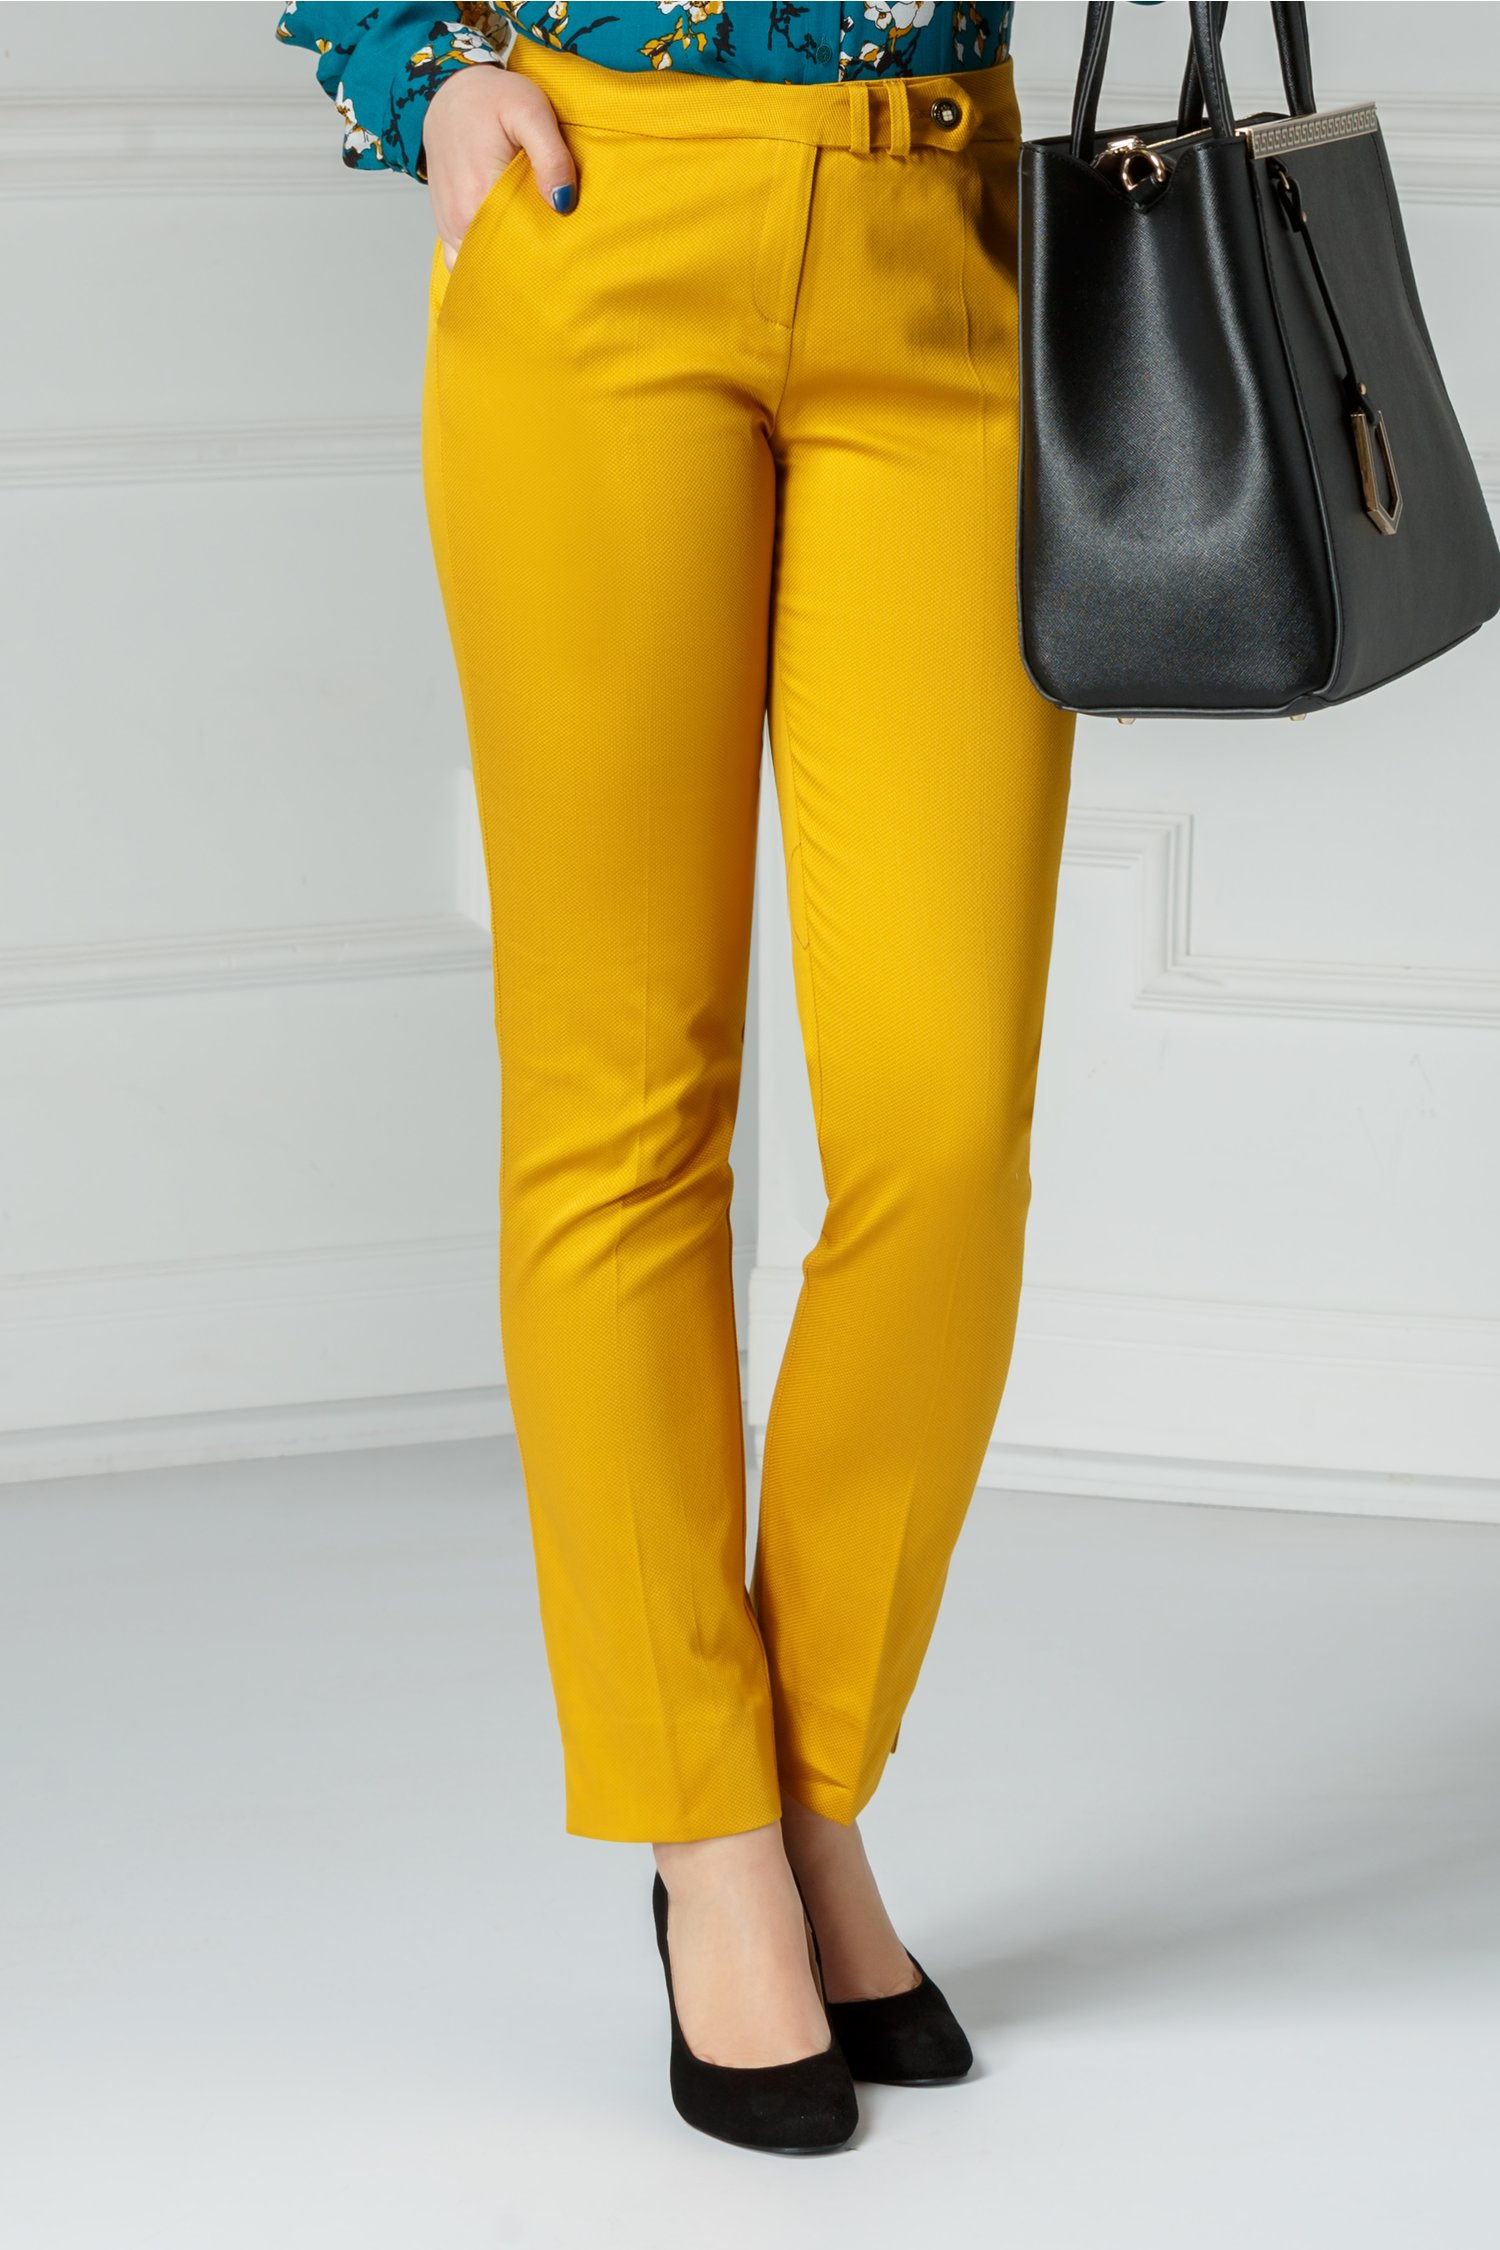 Pantalon Debra office galben din bumbac